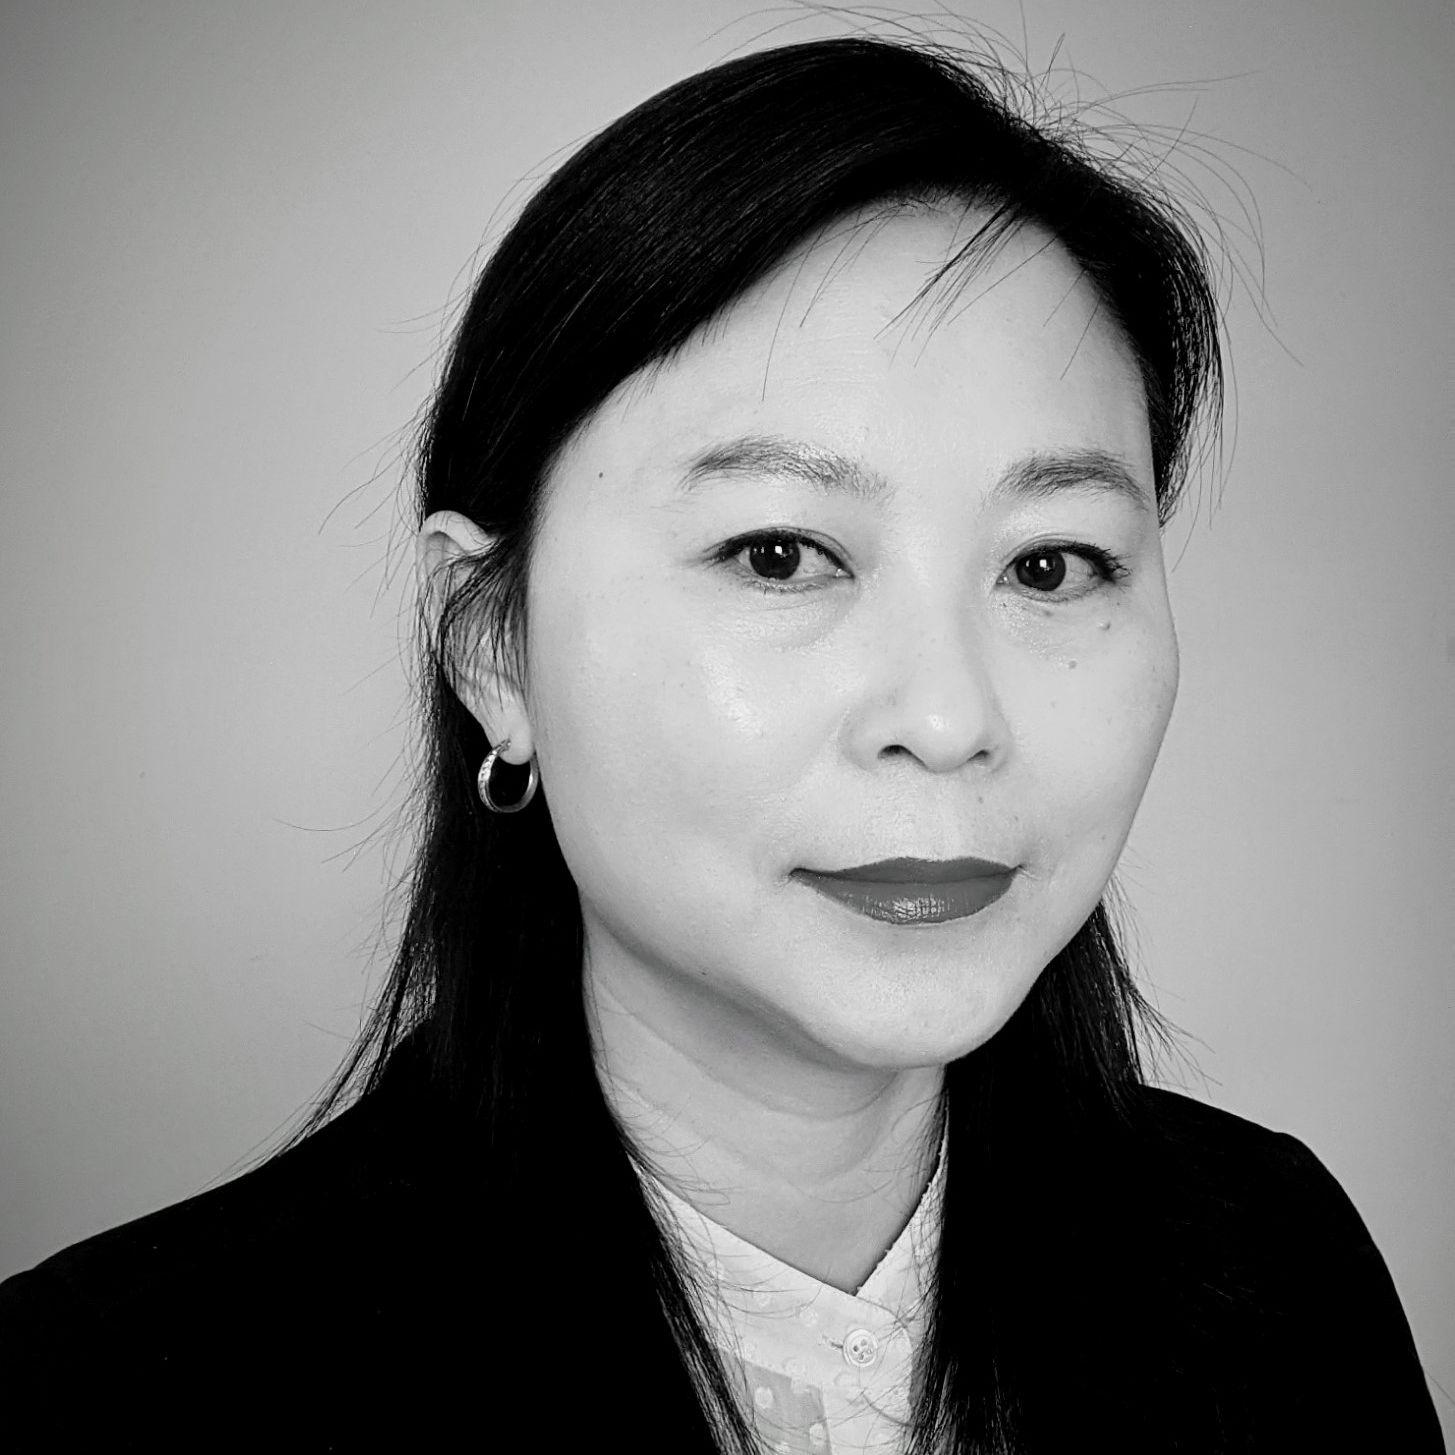 Cathleen Jing Cao